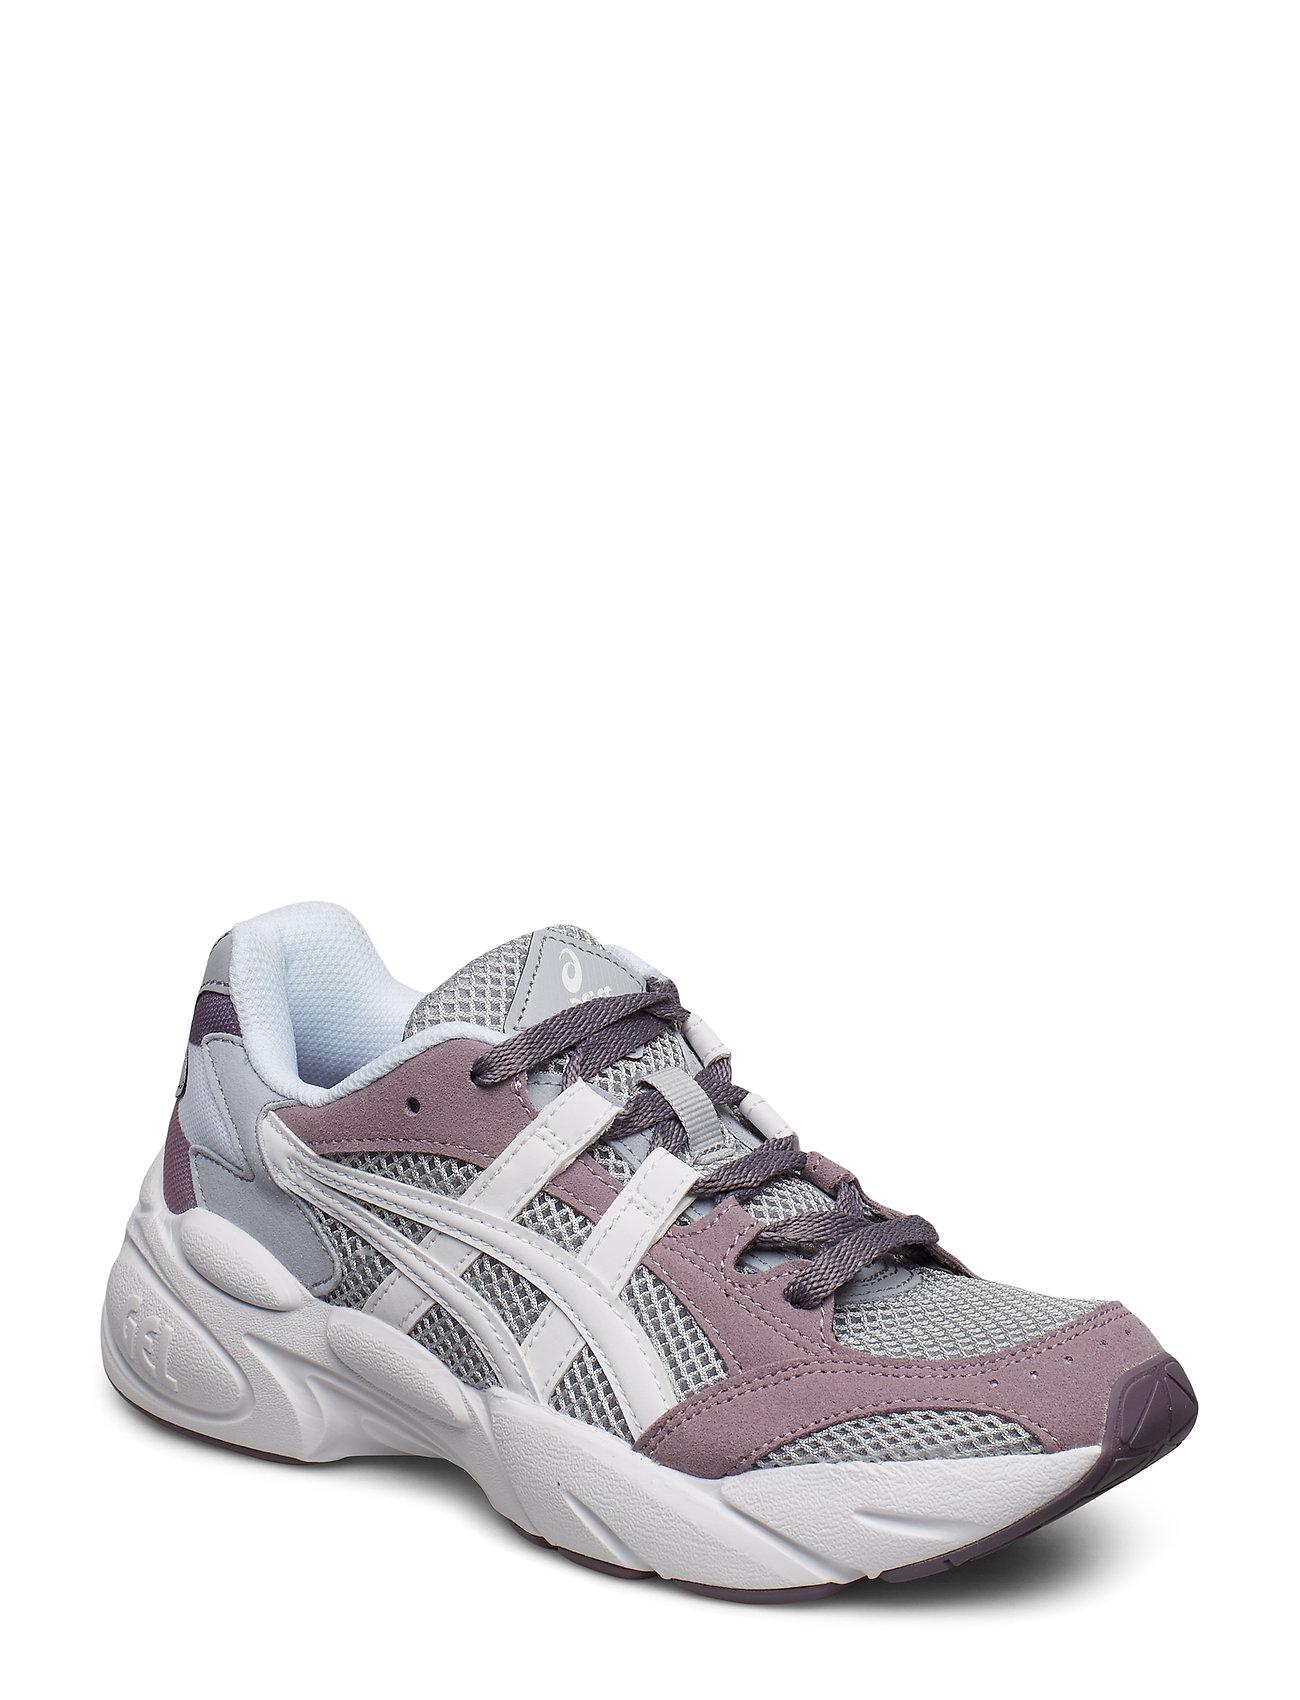 ASICS Gel-Bnd Niedrige Sneaker Grau ASICS